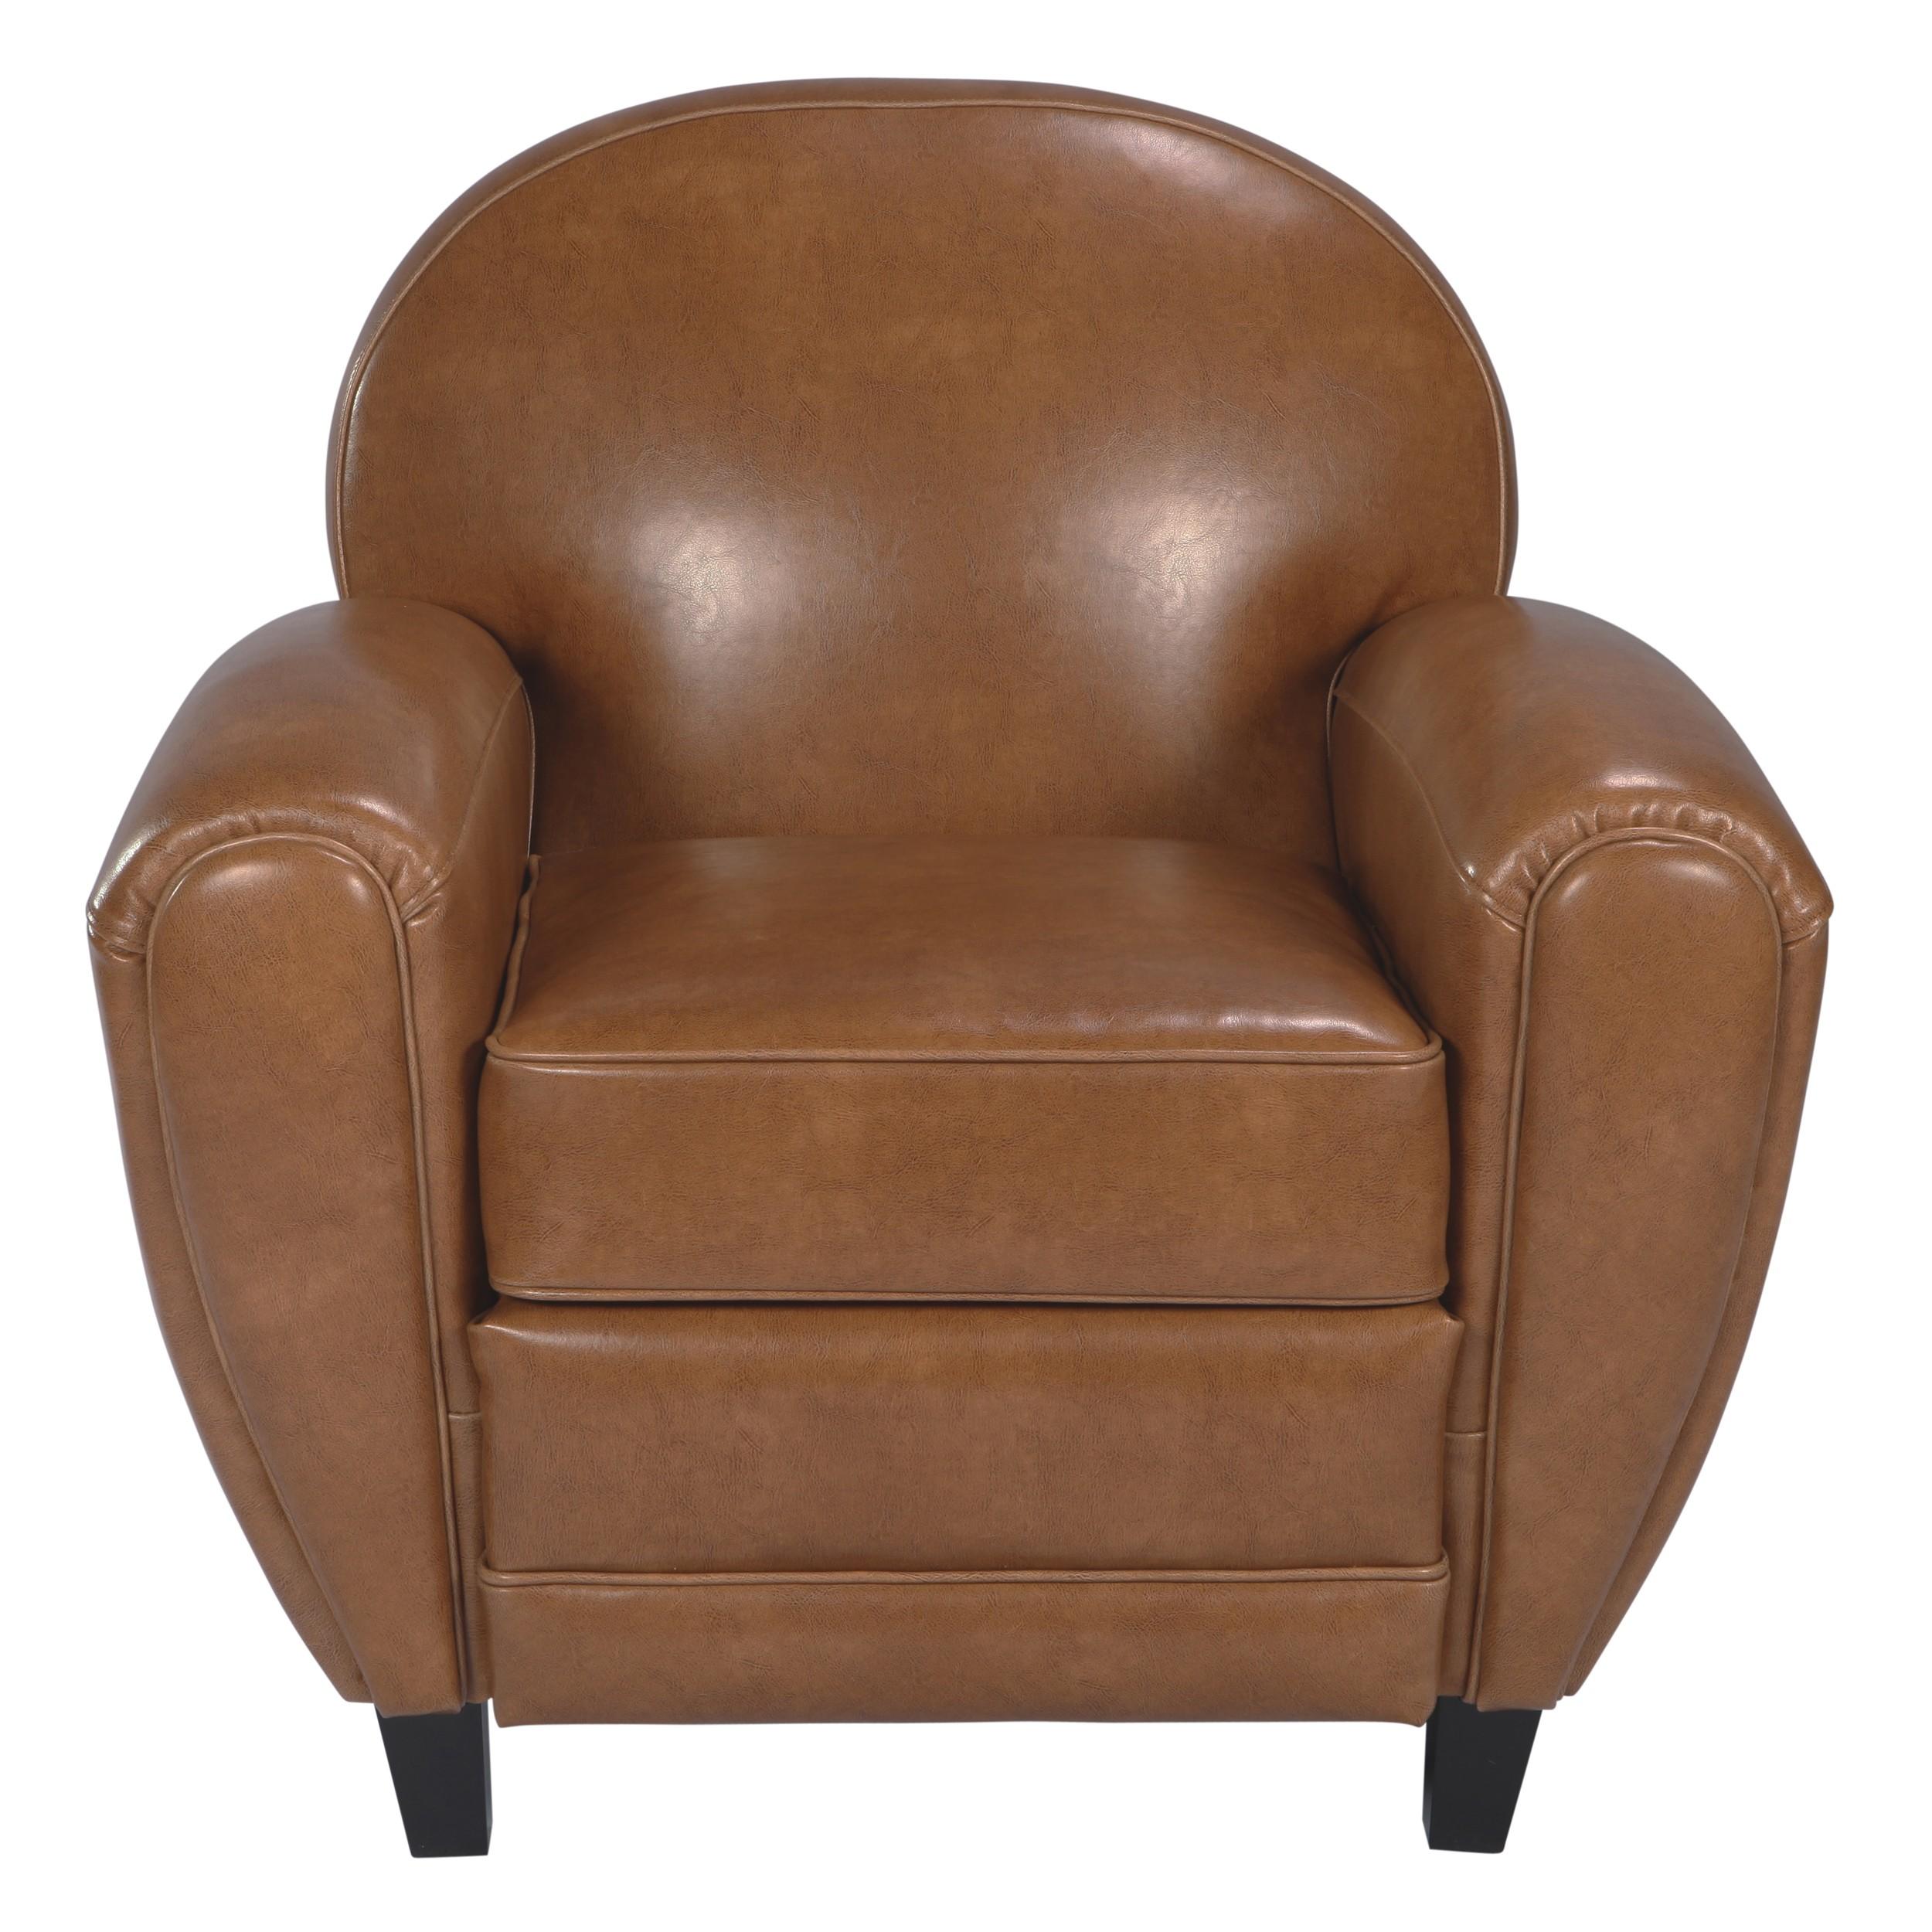 acheter fauteuil club camel beige